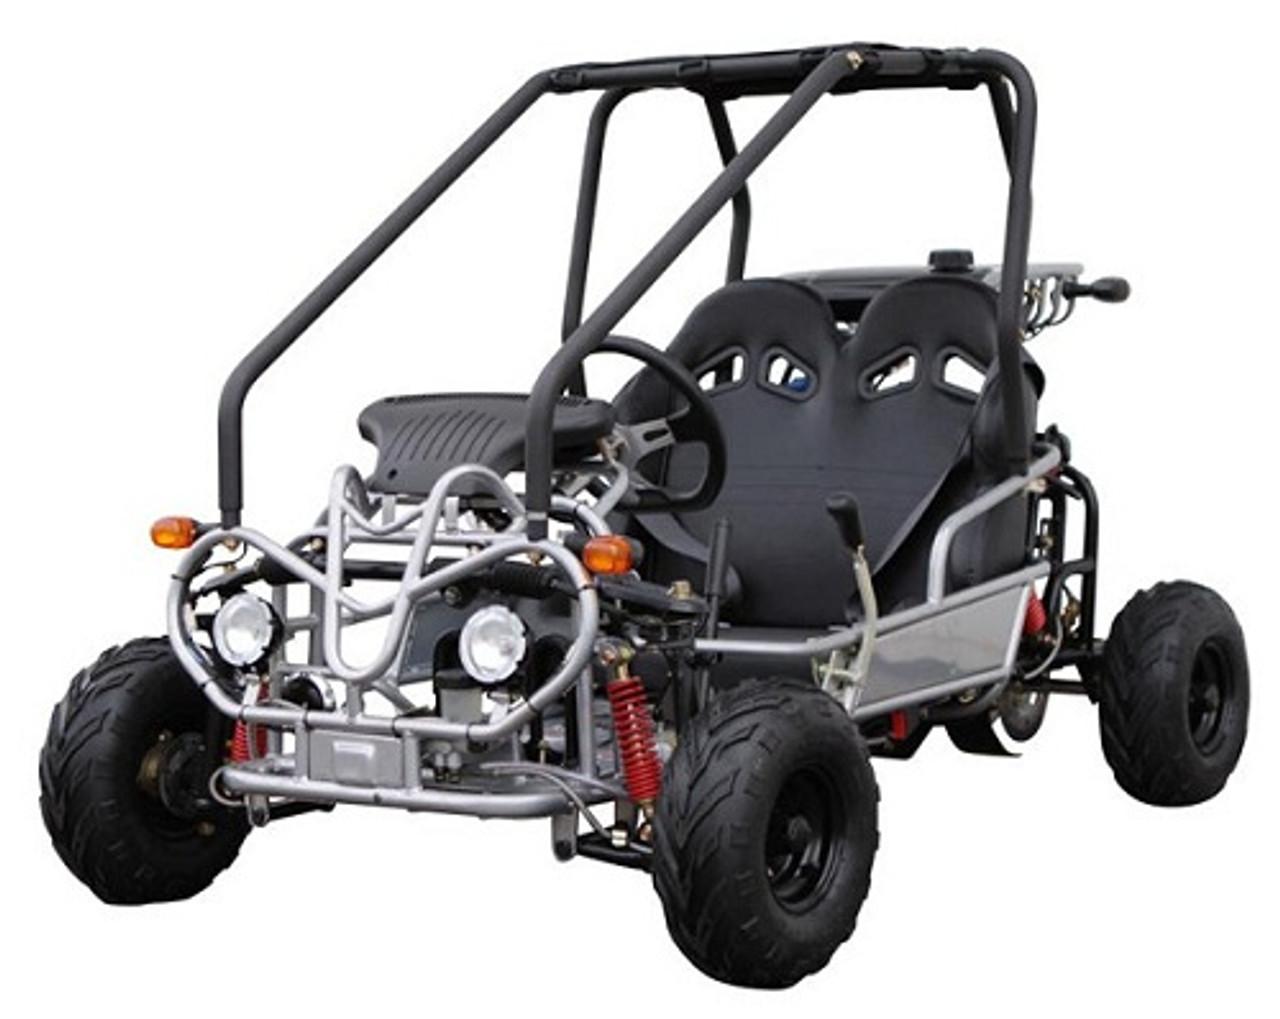 Vitacci RAPTOR-mini KD-110cc GKG-2 Go Kart, Single Cylinder / 4 STROKE/ Automatic (Optional Reverse)